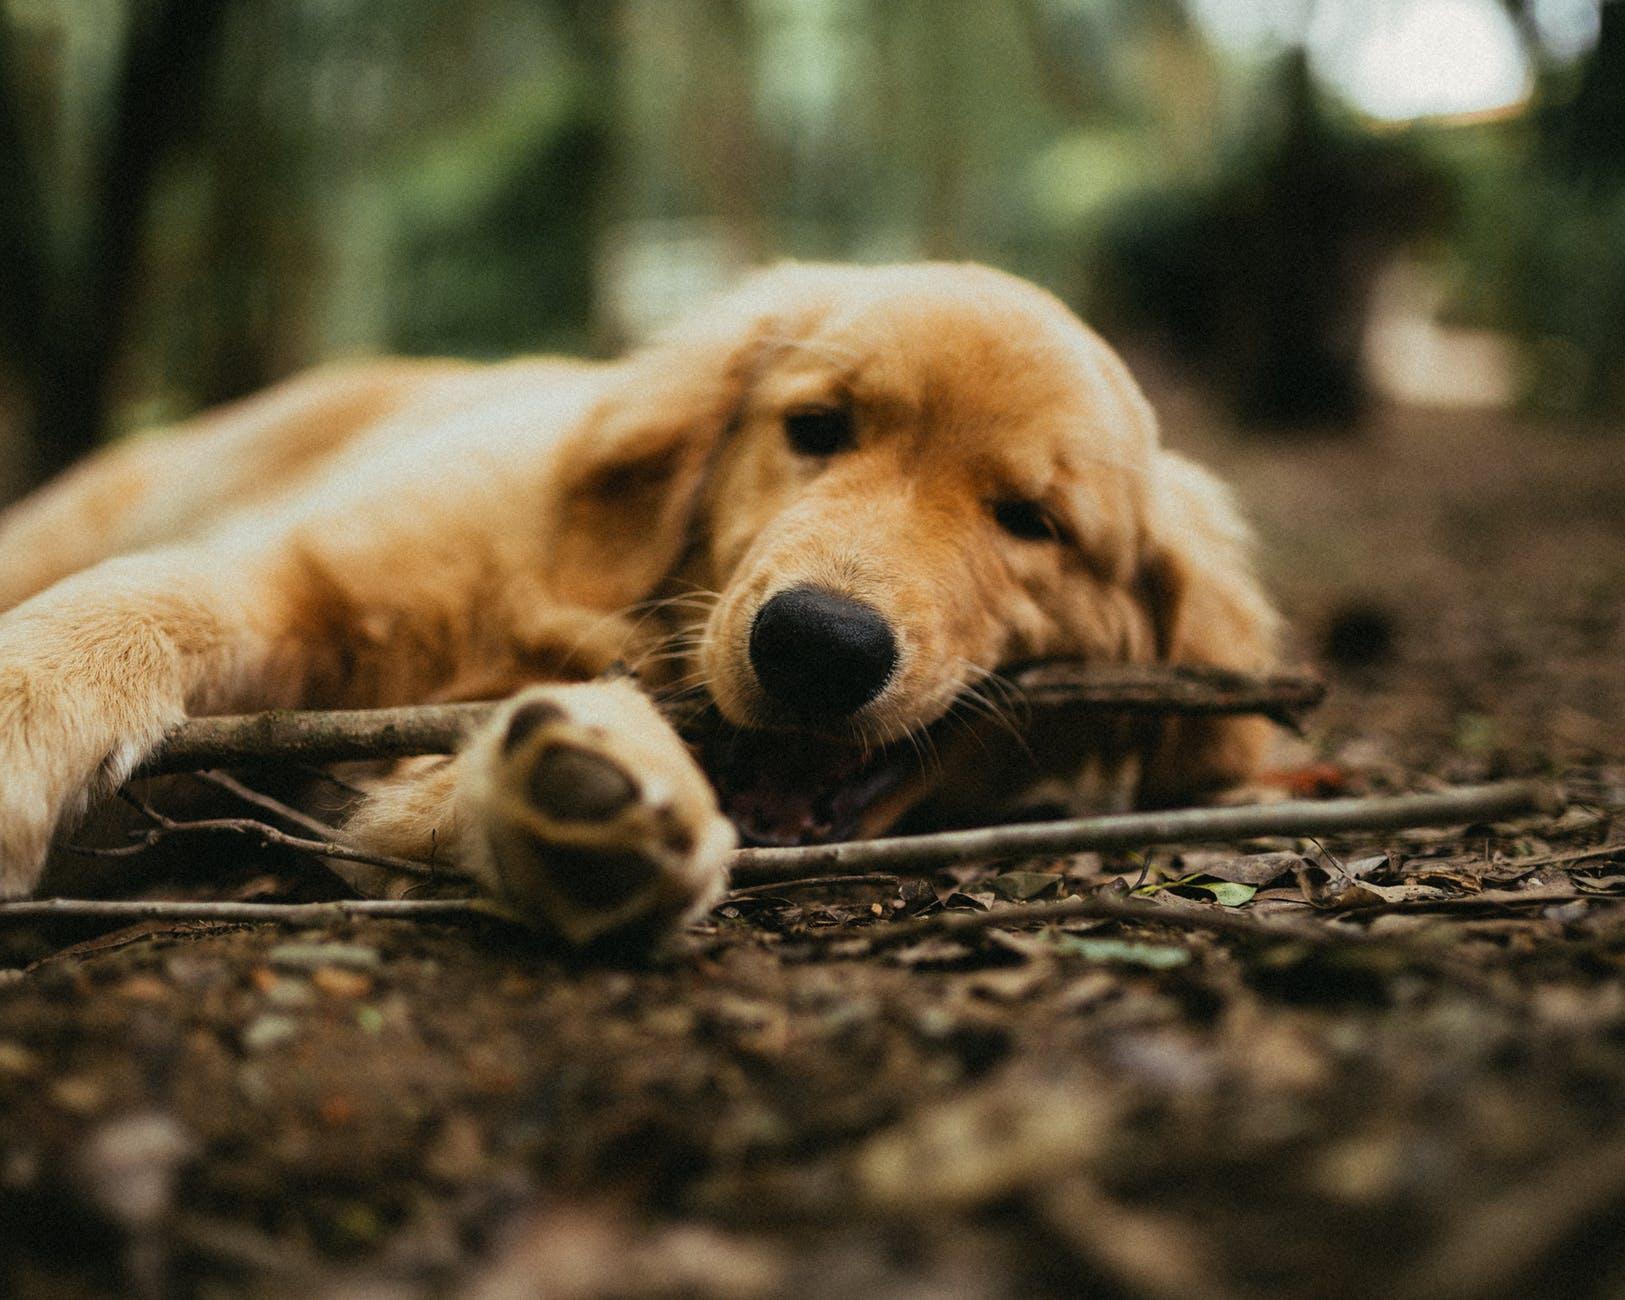 close up photo of dog biting branch